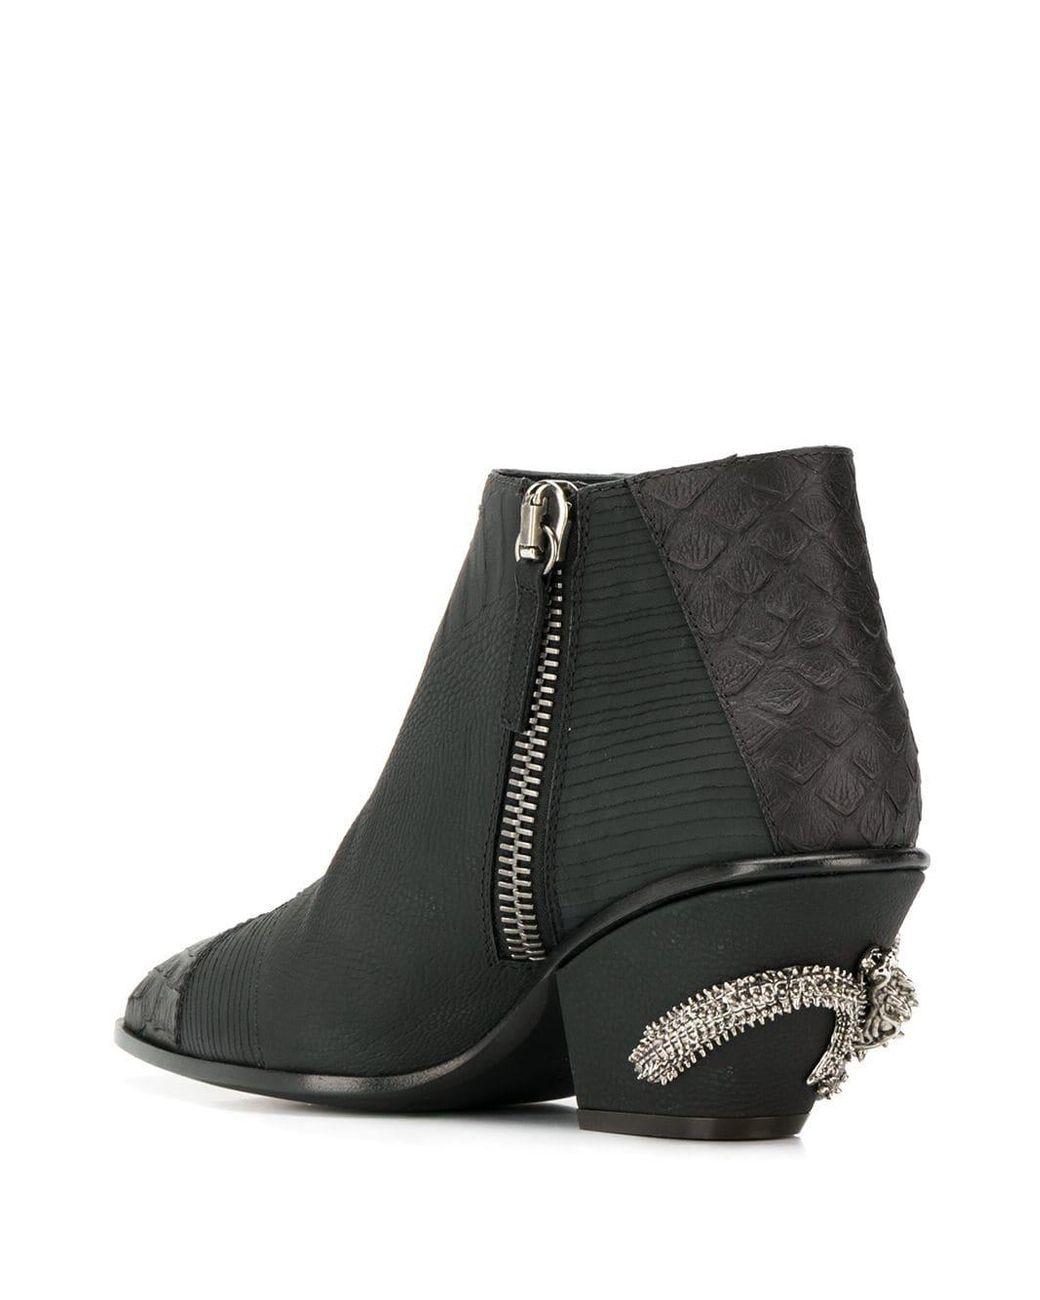 0aa120d024f64 Lyst - Giuseppe Zanotti Kevan Alligator Print Ankle Boots in Black